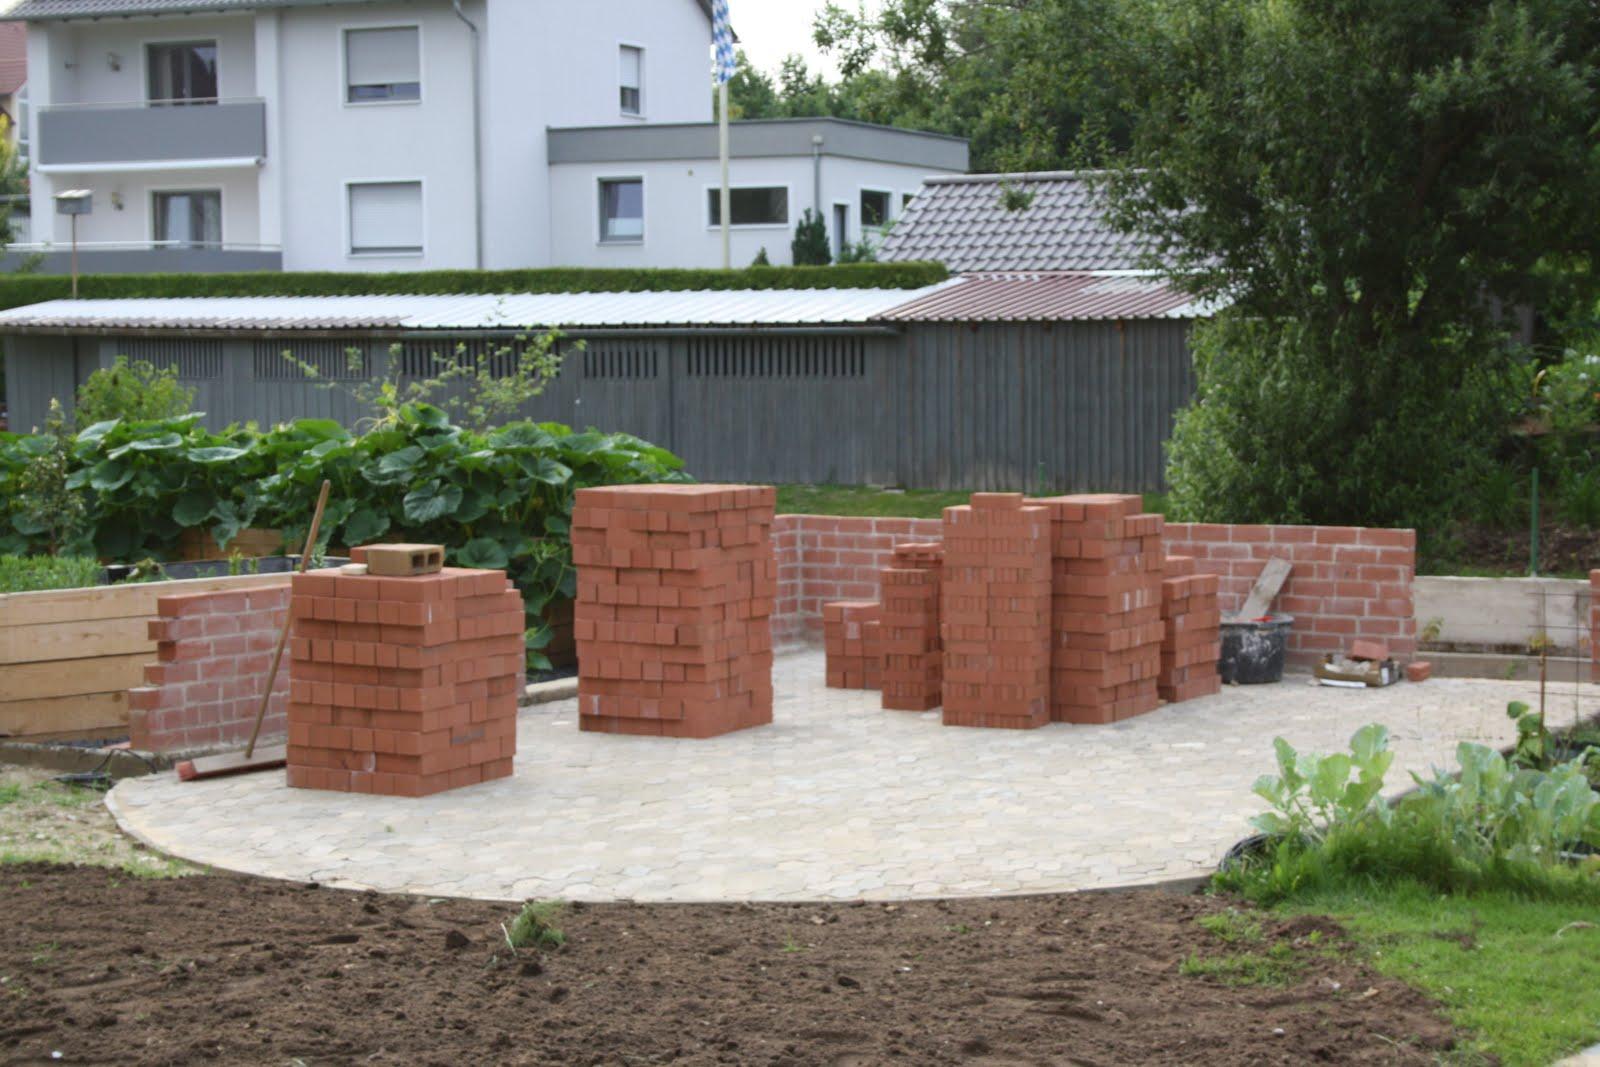 Garten Und Grill Projekt Brotbackofen